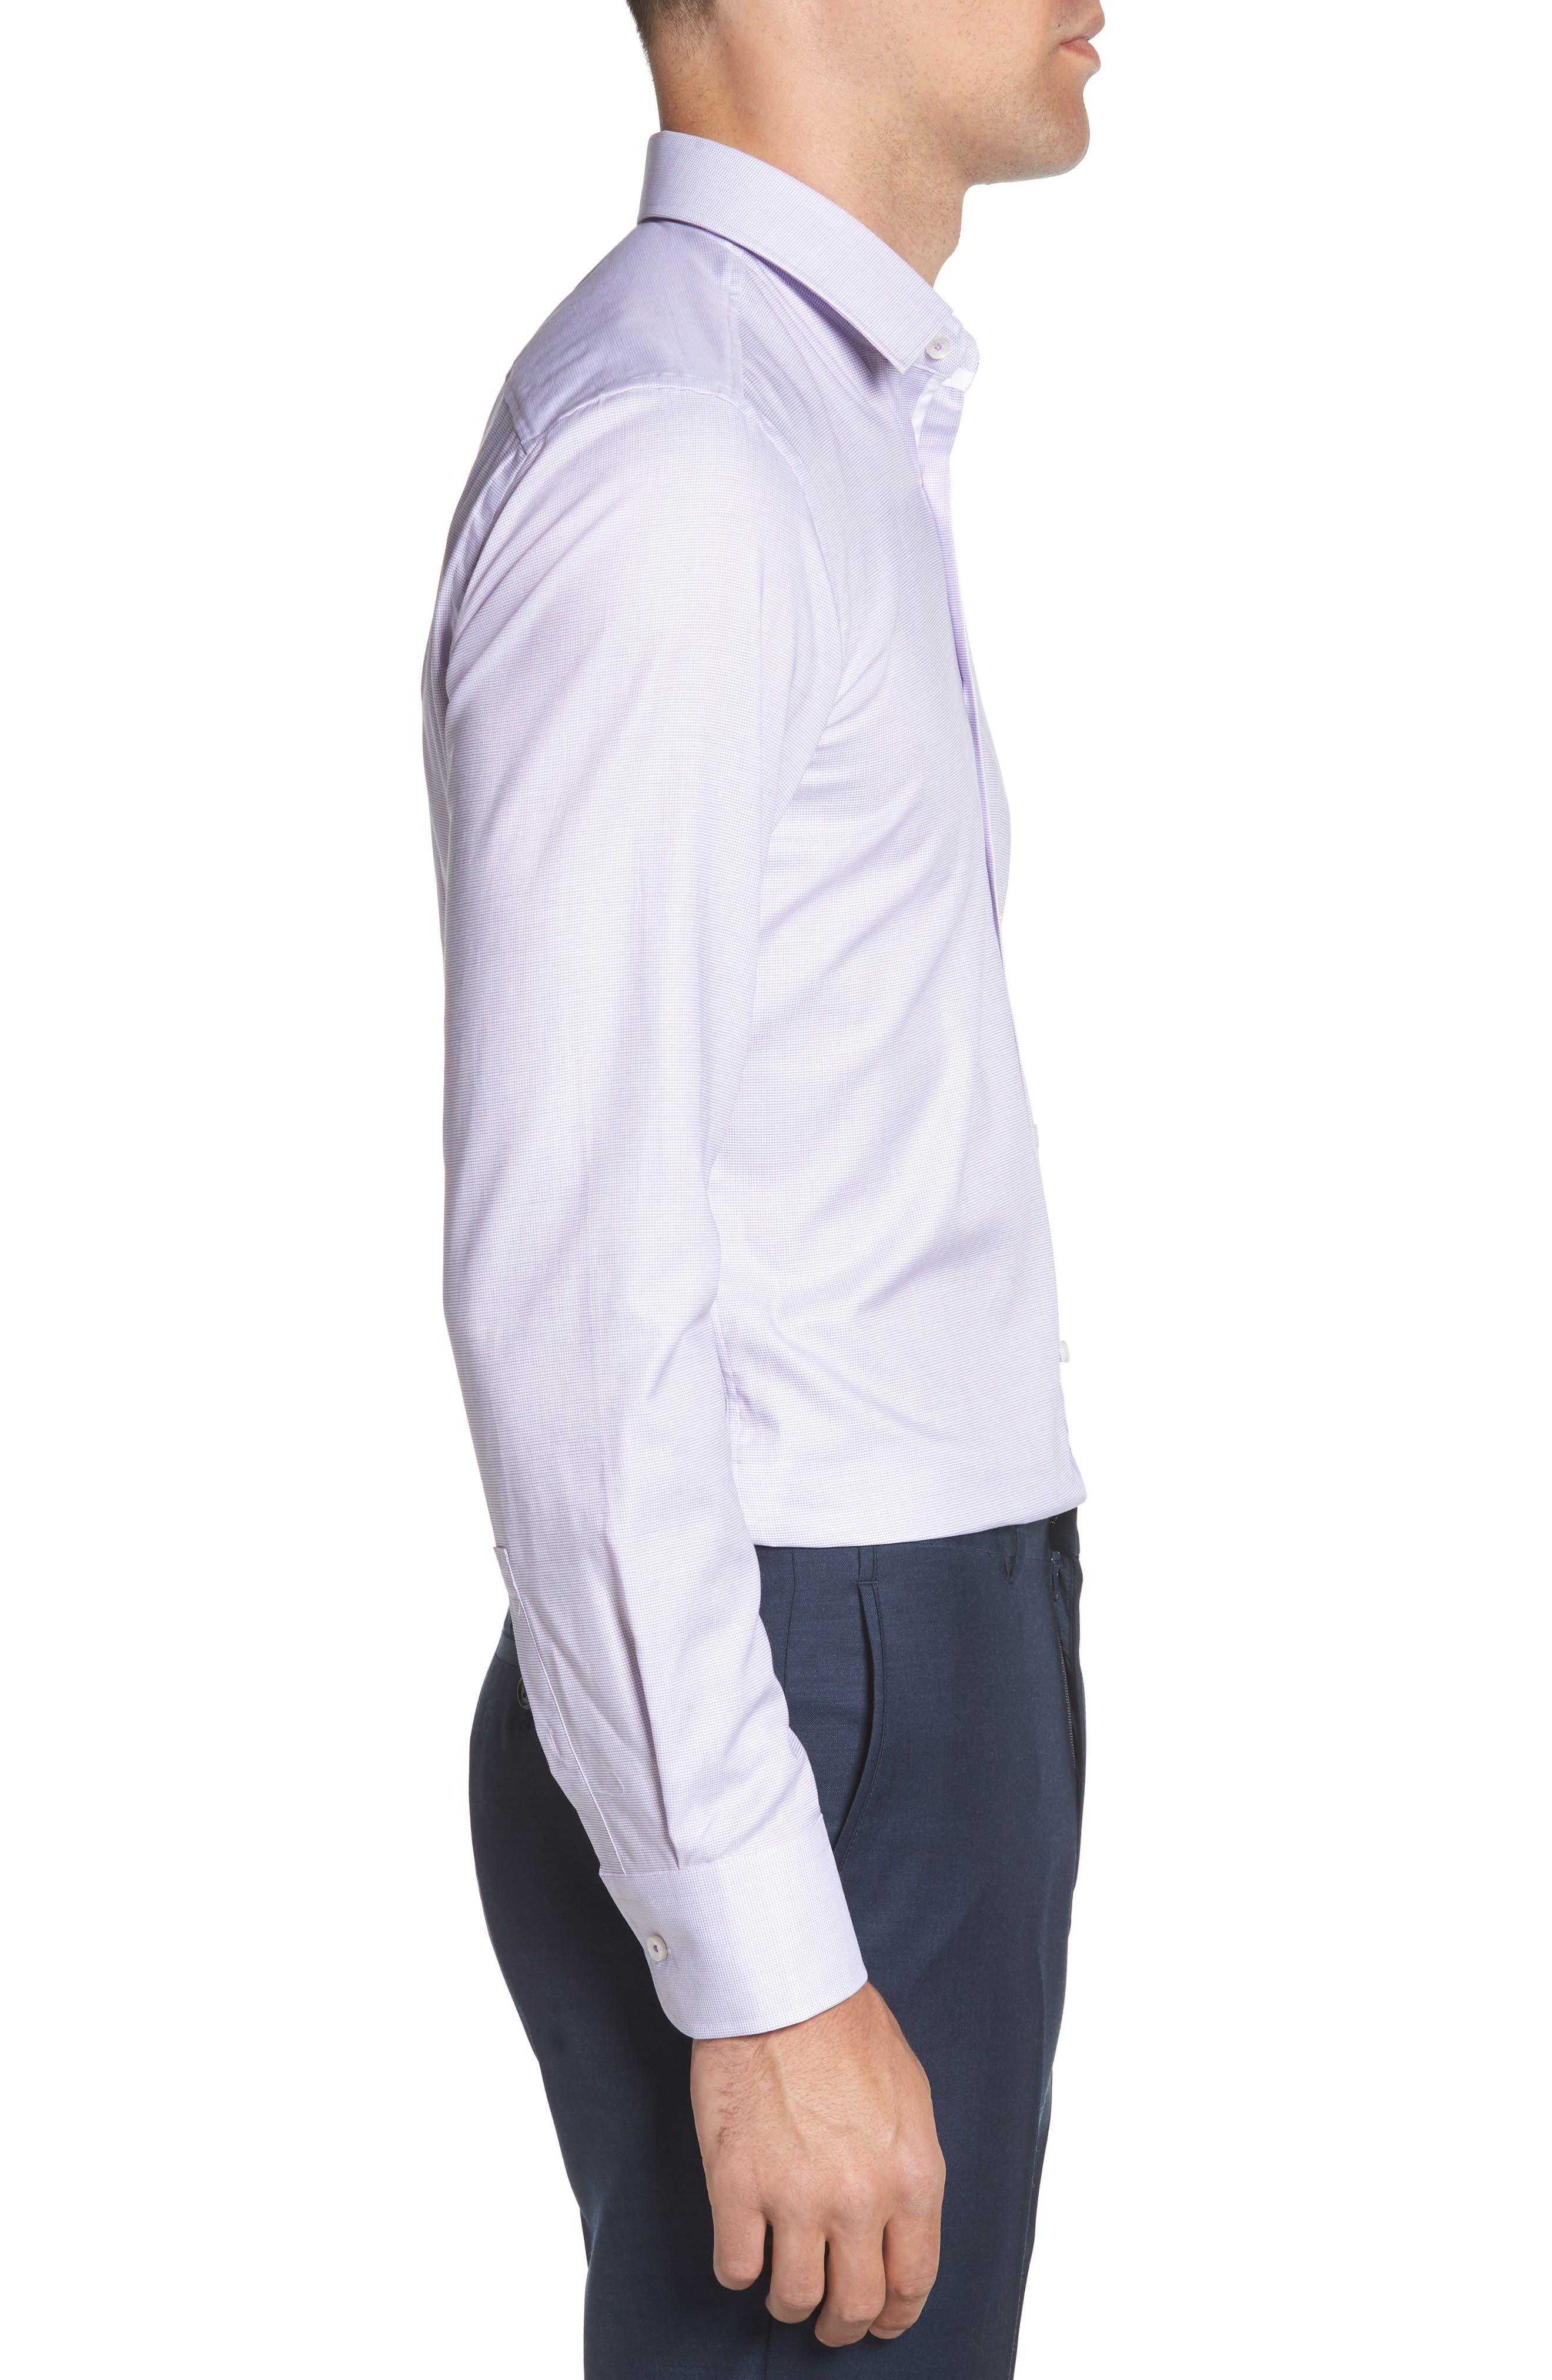 Jesse Slim Fit Dress Shirt,                             Alternate thumbnail 4, color,                             512